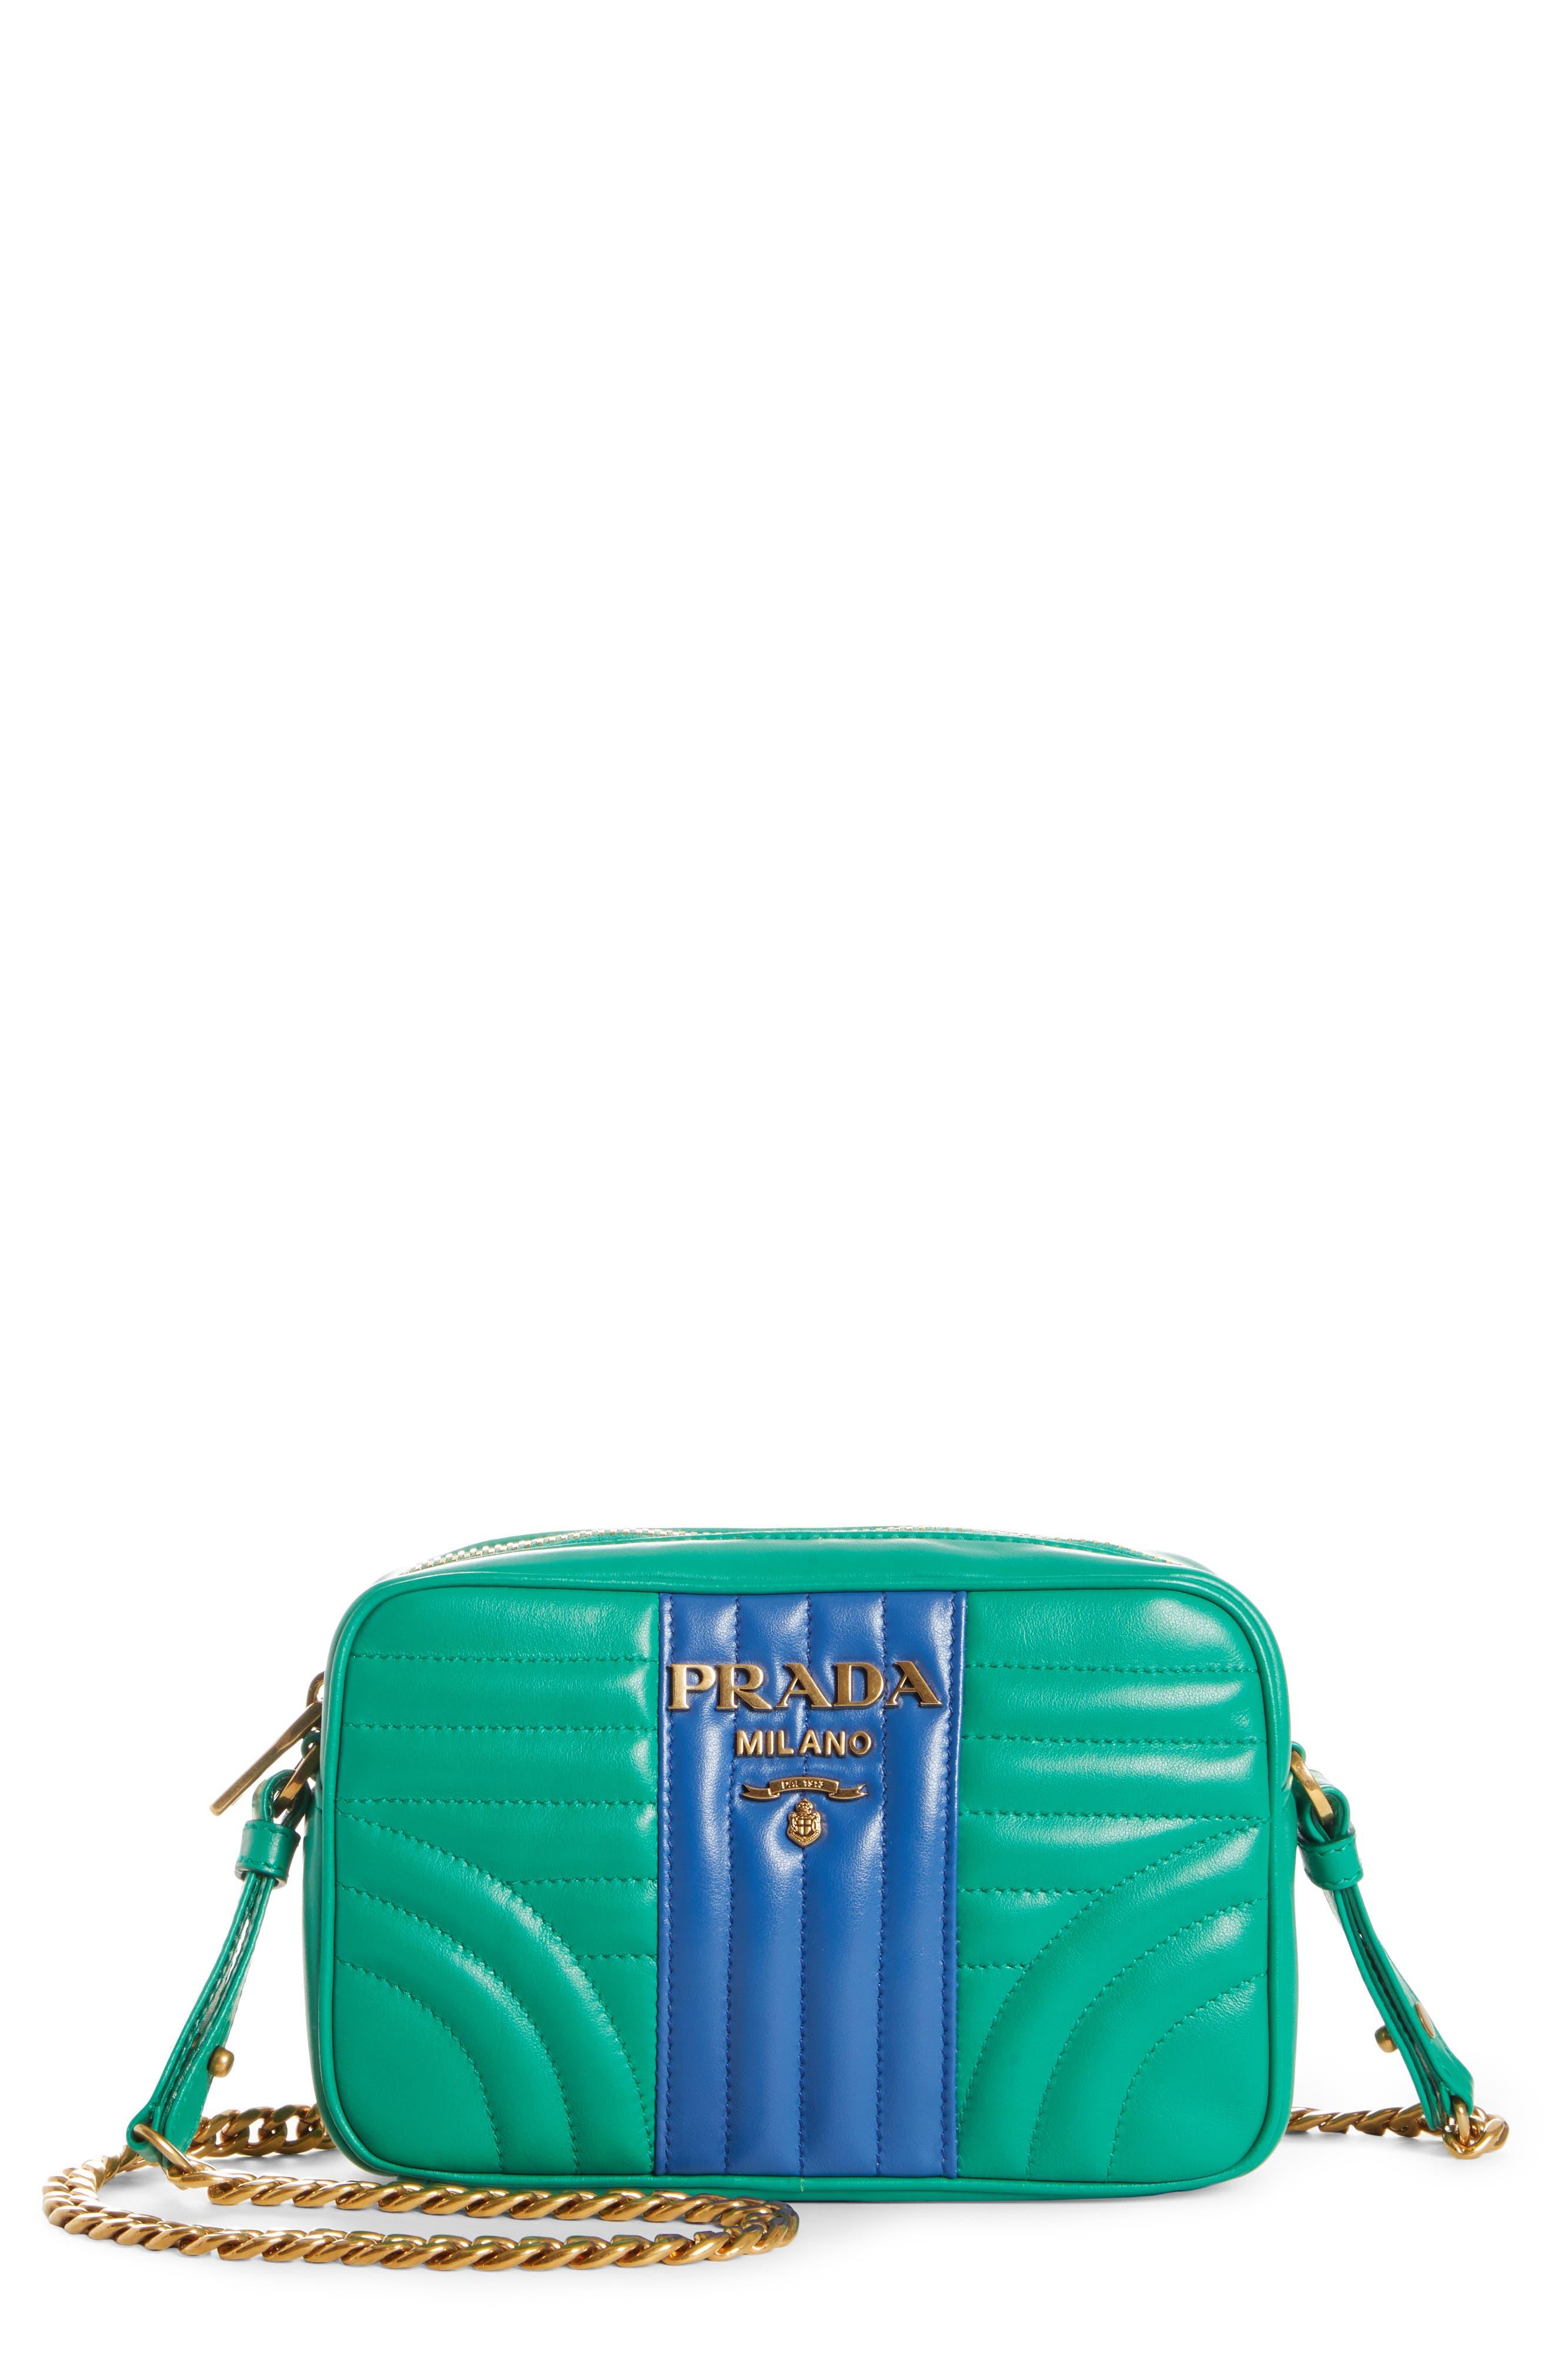 PRADA,                             Diagrammed Colorblock Leather Camera Bag,                             Main thumbnail 1, color,                             MANGO/ AZZURRO